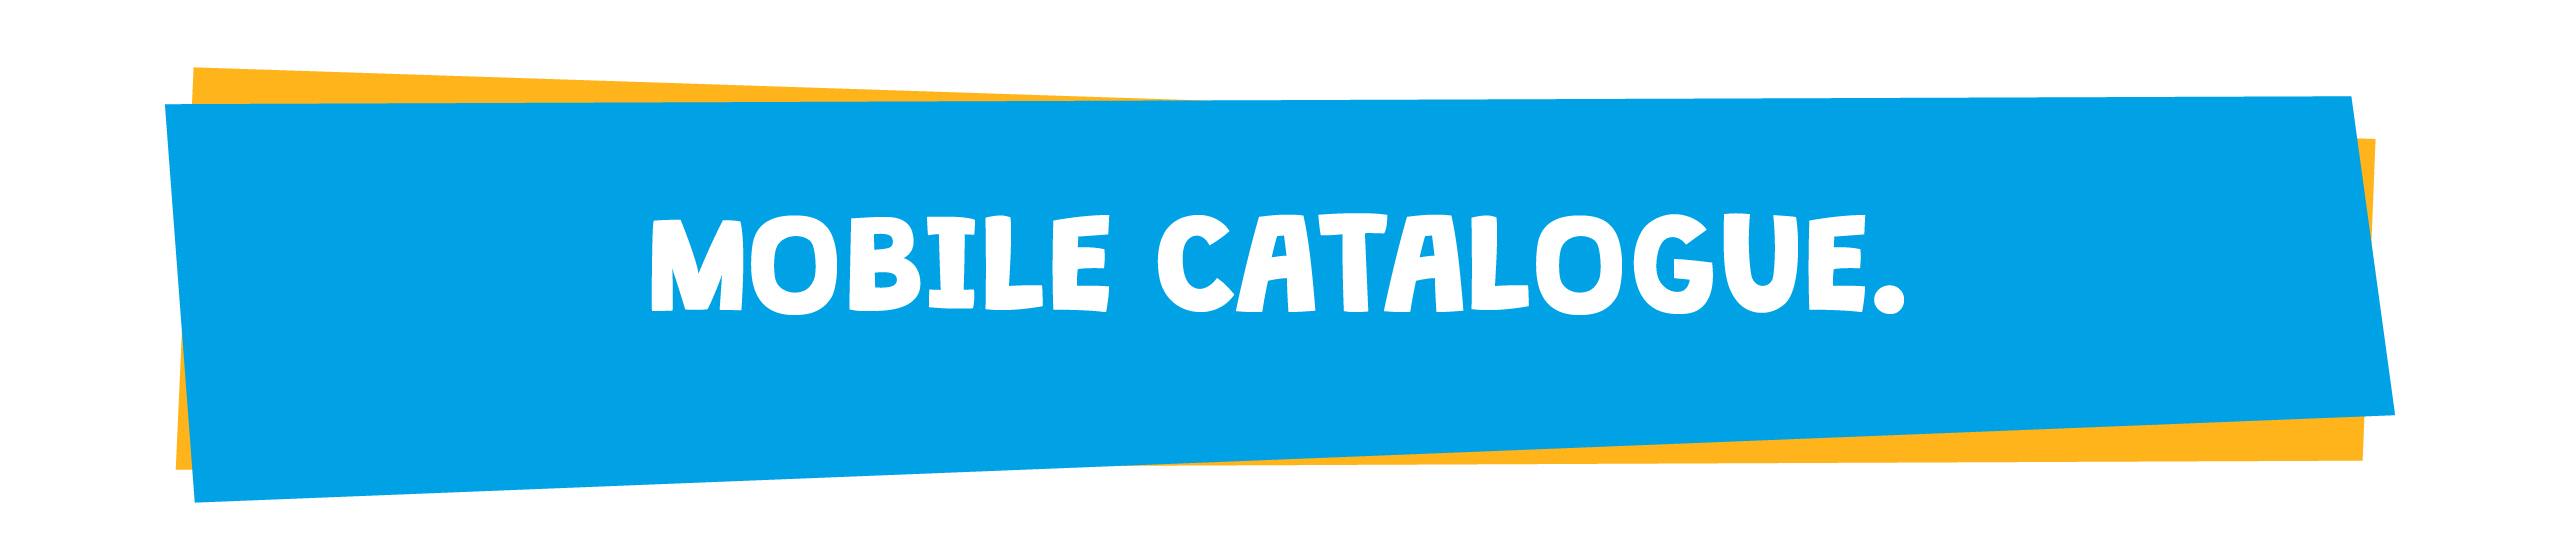 Mobile-catalogue